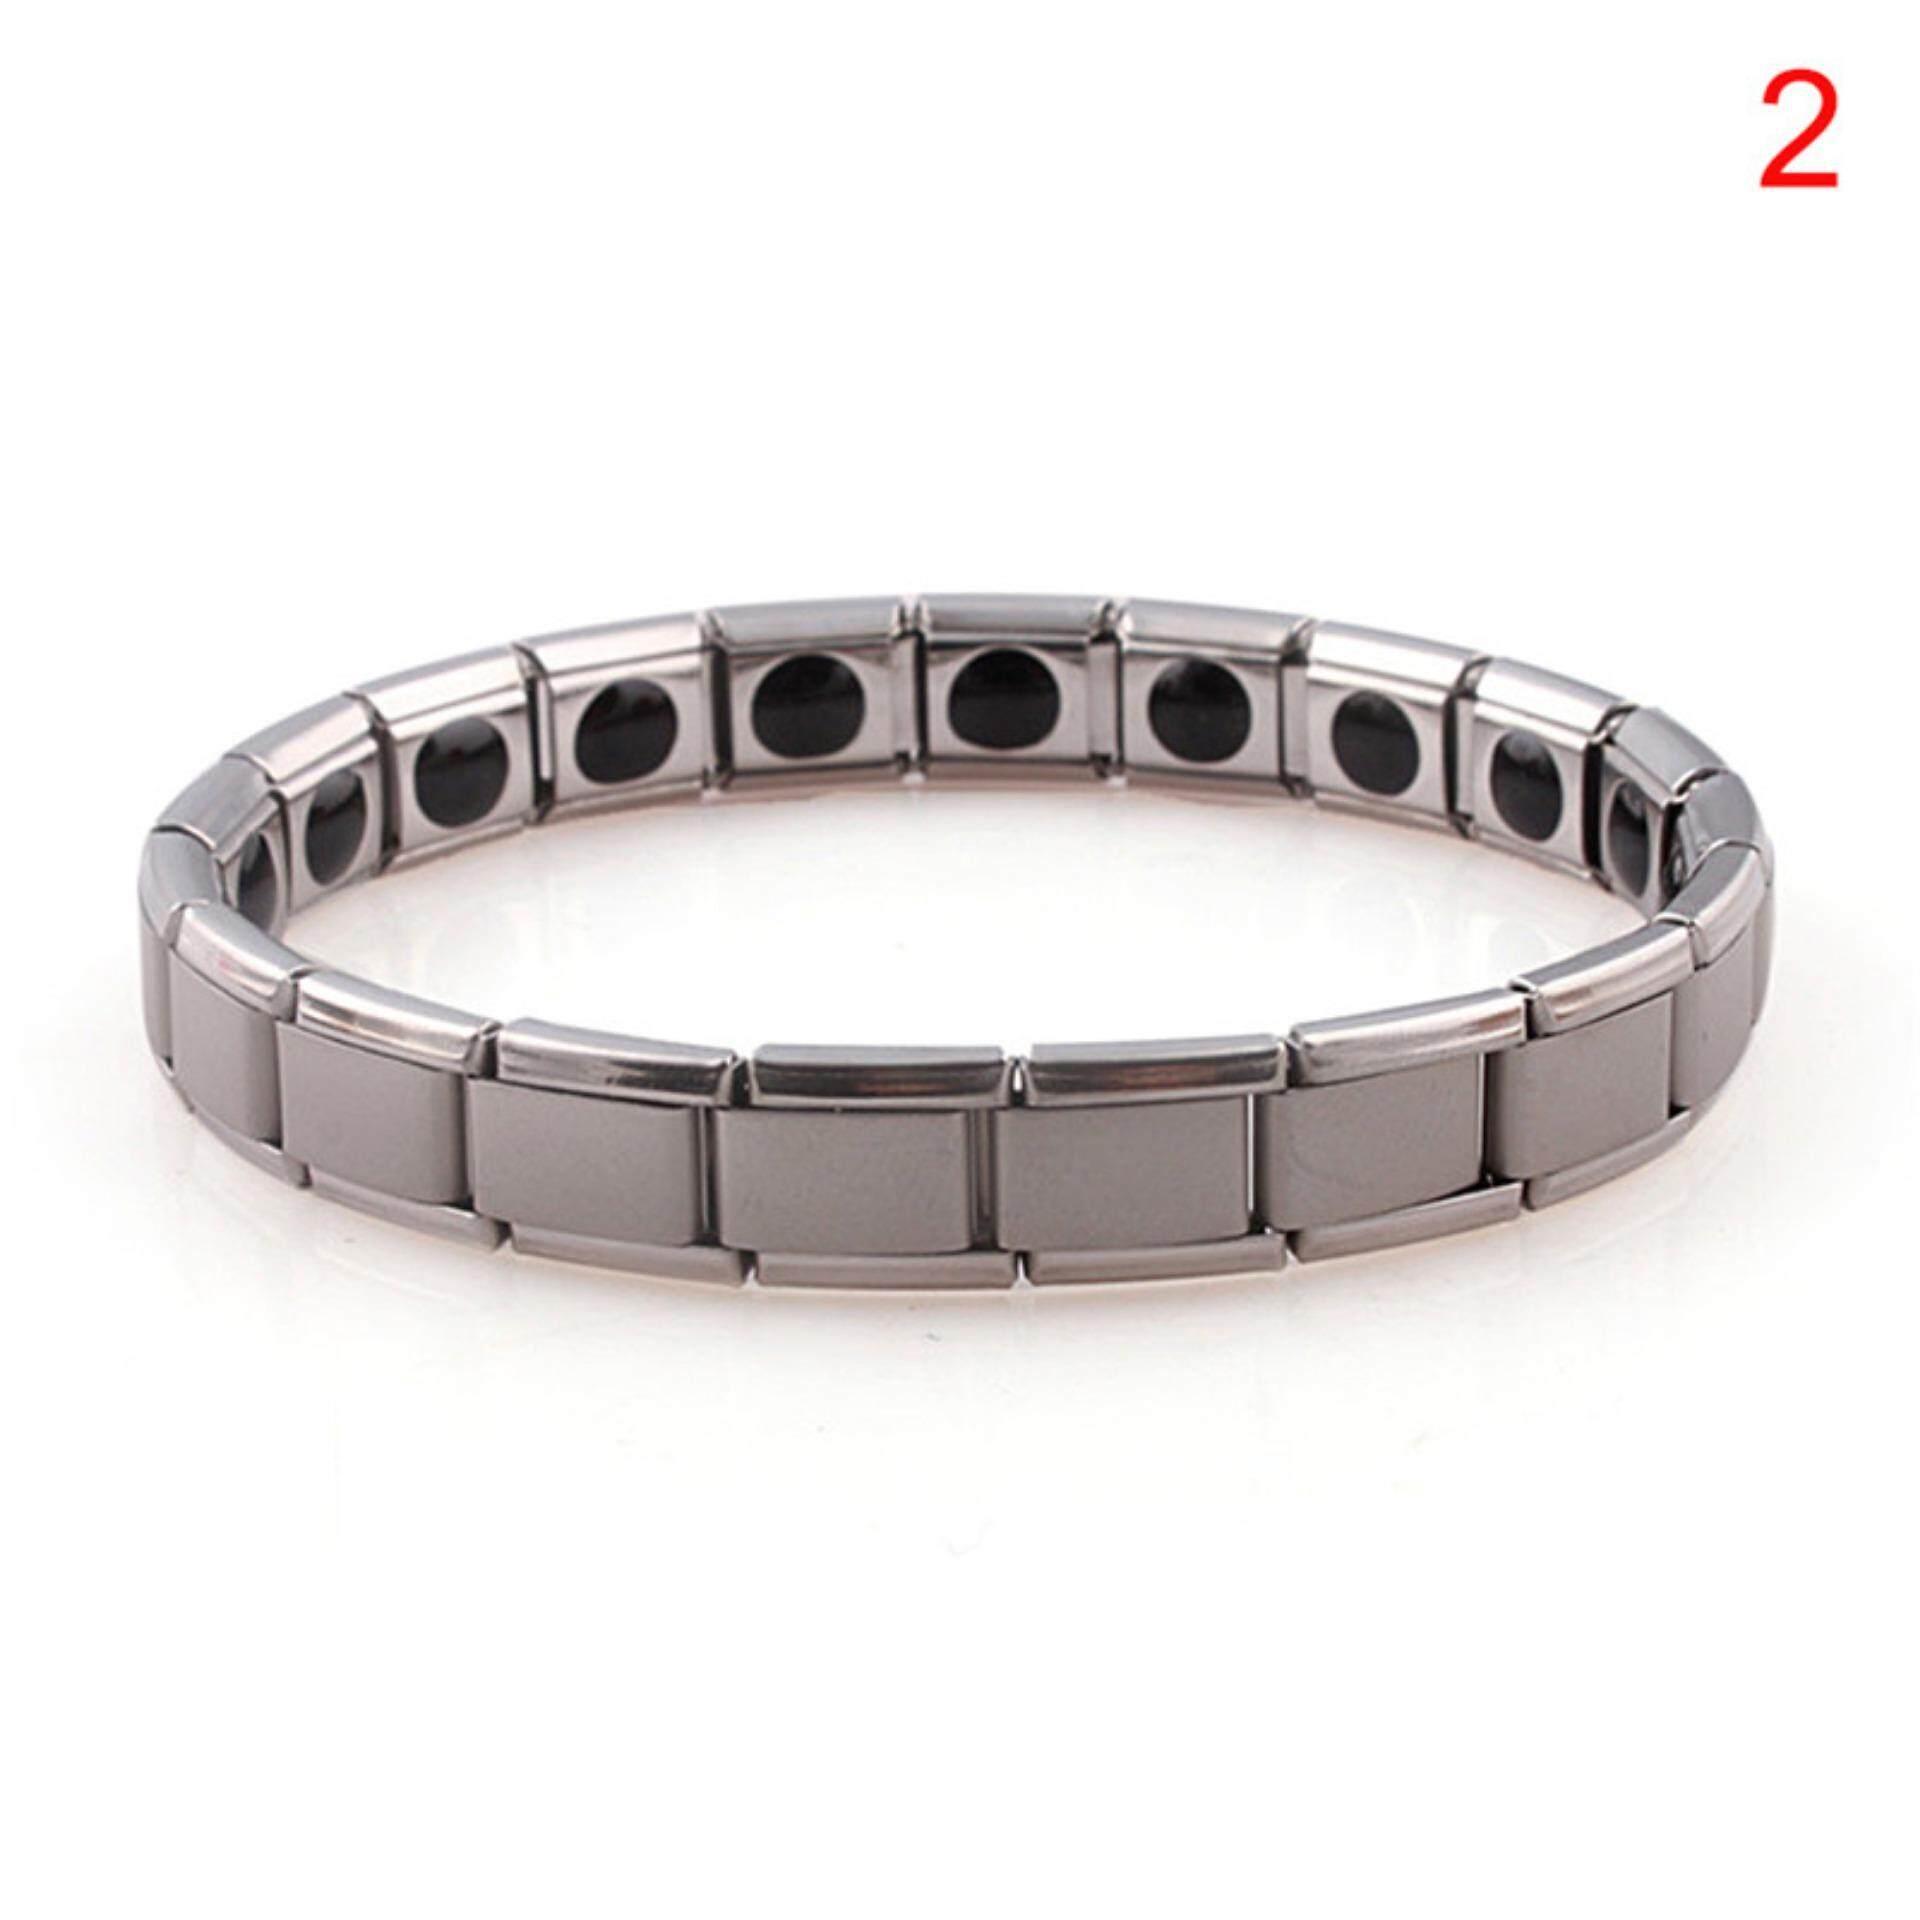 Titanium Steel Elastic Stretch Bracelet For Men Women Energy Health Bangle Silver 19cm